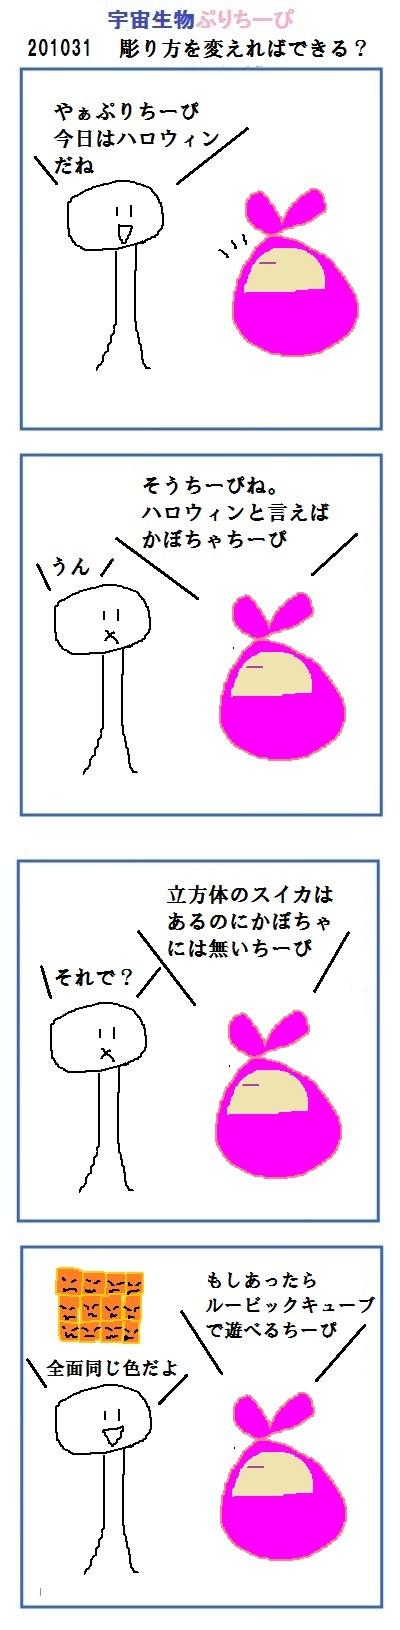 201031-pry.jpg